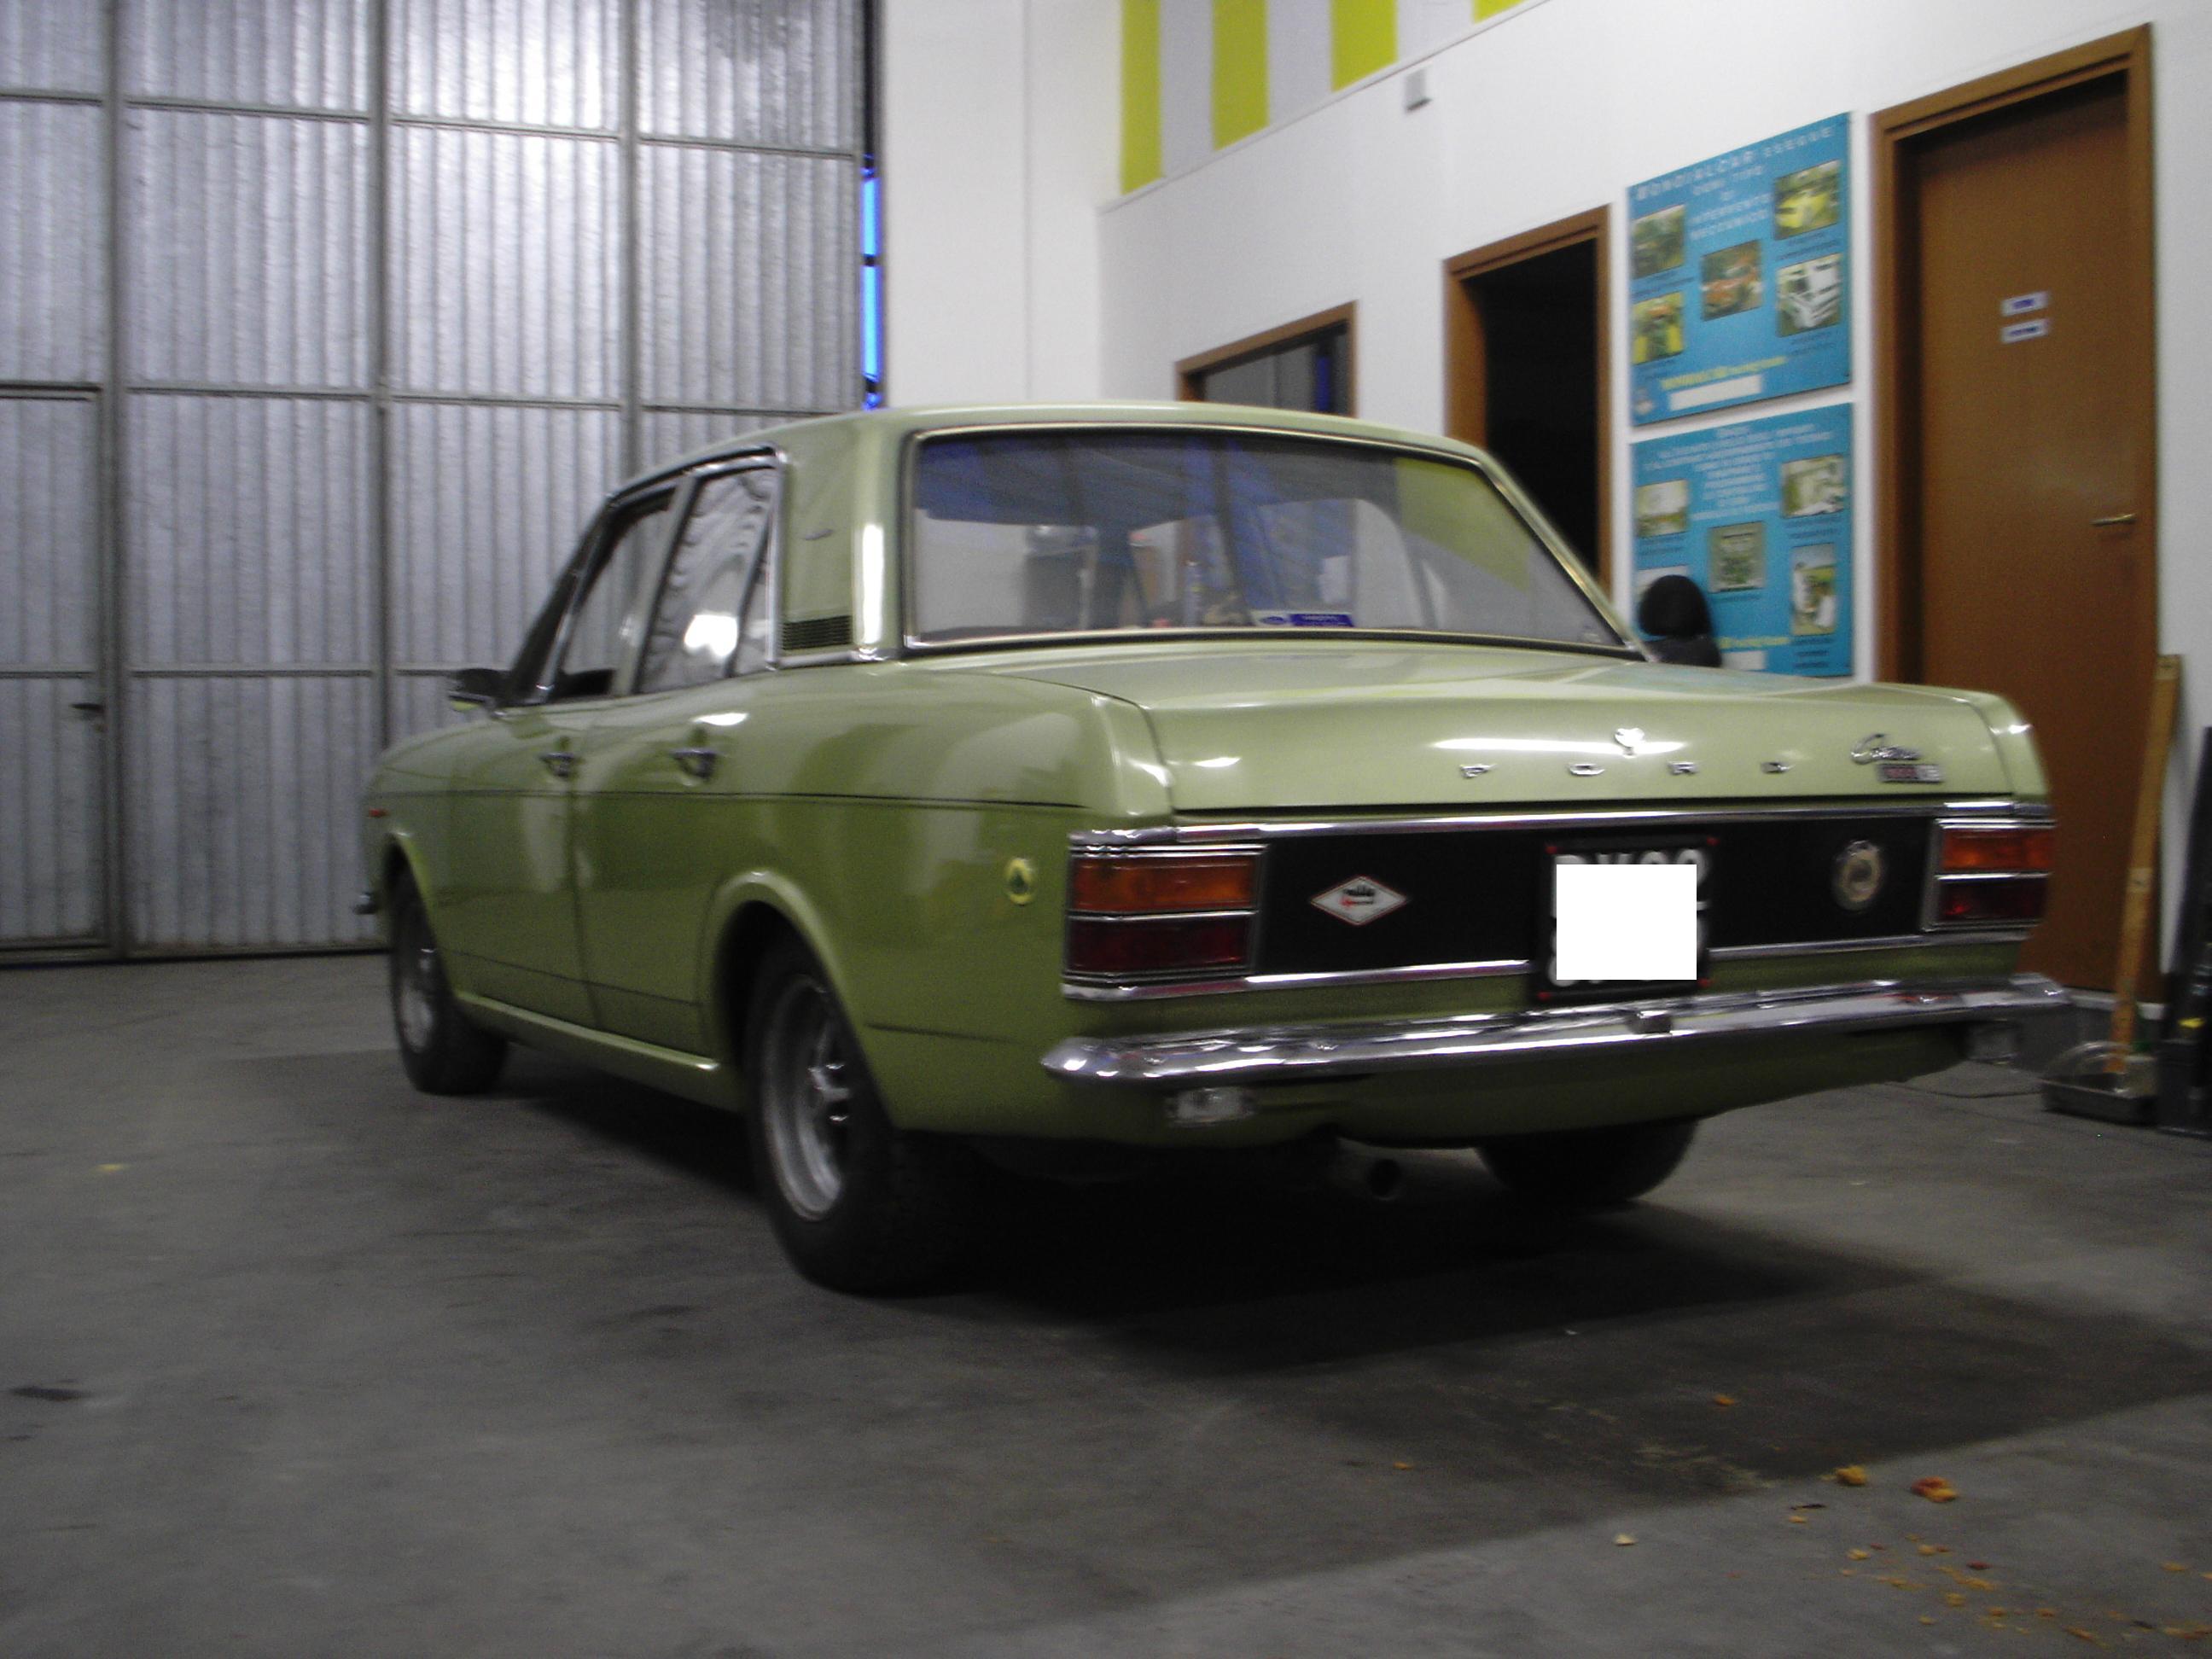 Ford Cortina MK3 lotus